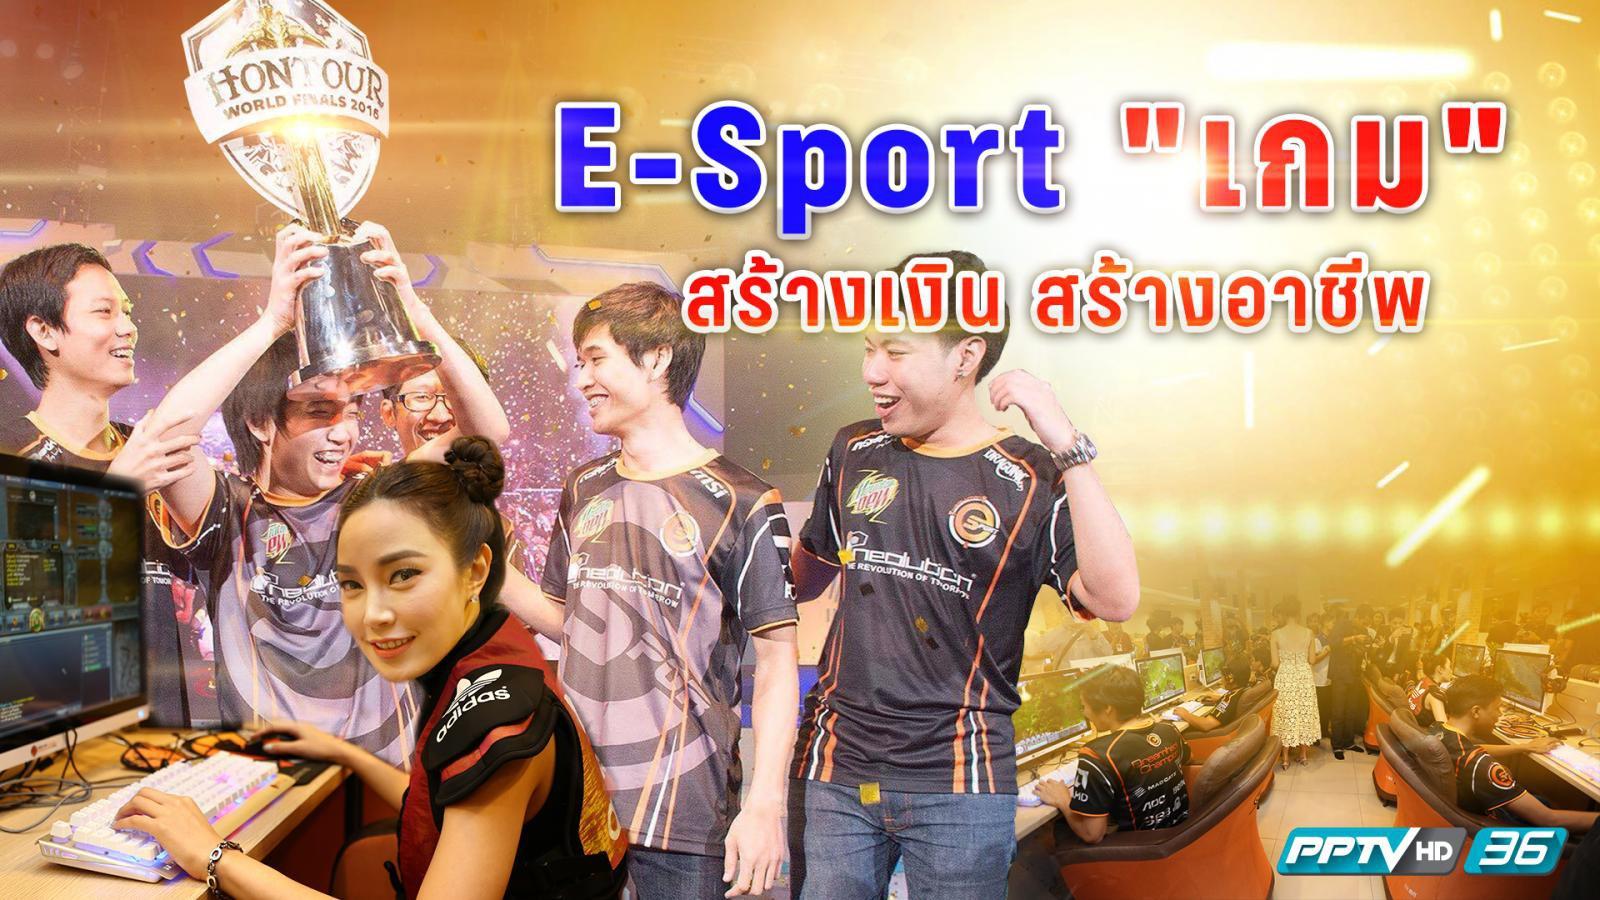 "E-Sport ""เกม"" สร้างเงิน สร้างอาชีพ"